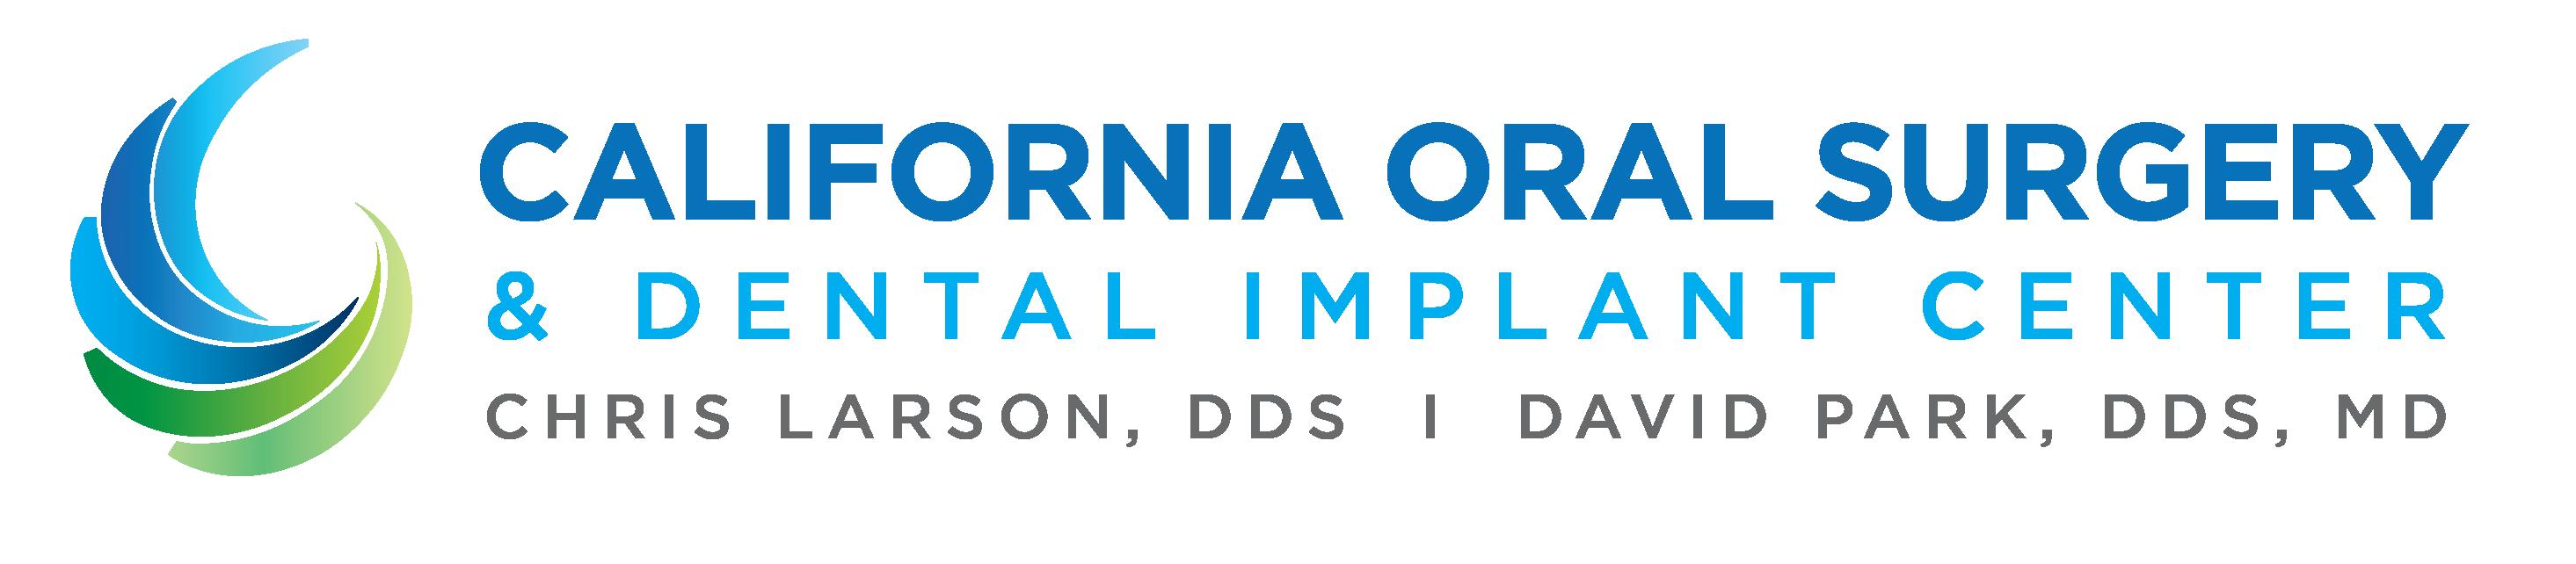 California Oral Surgery & Dental Implant Center image 1